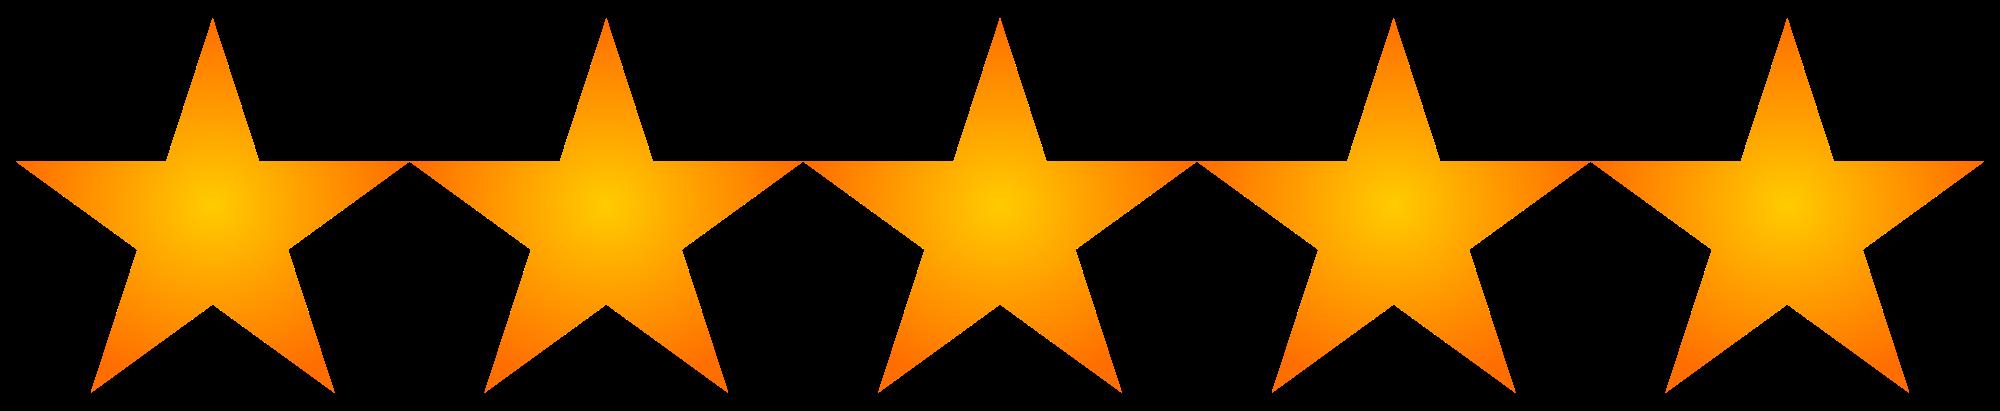 Star svg #1, Download drawings